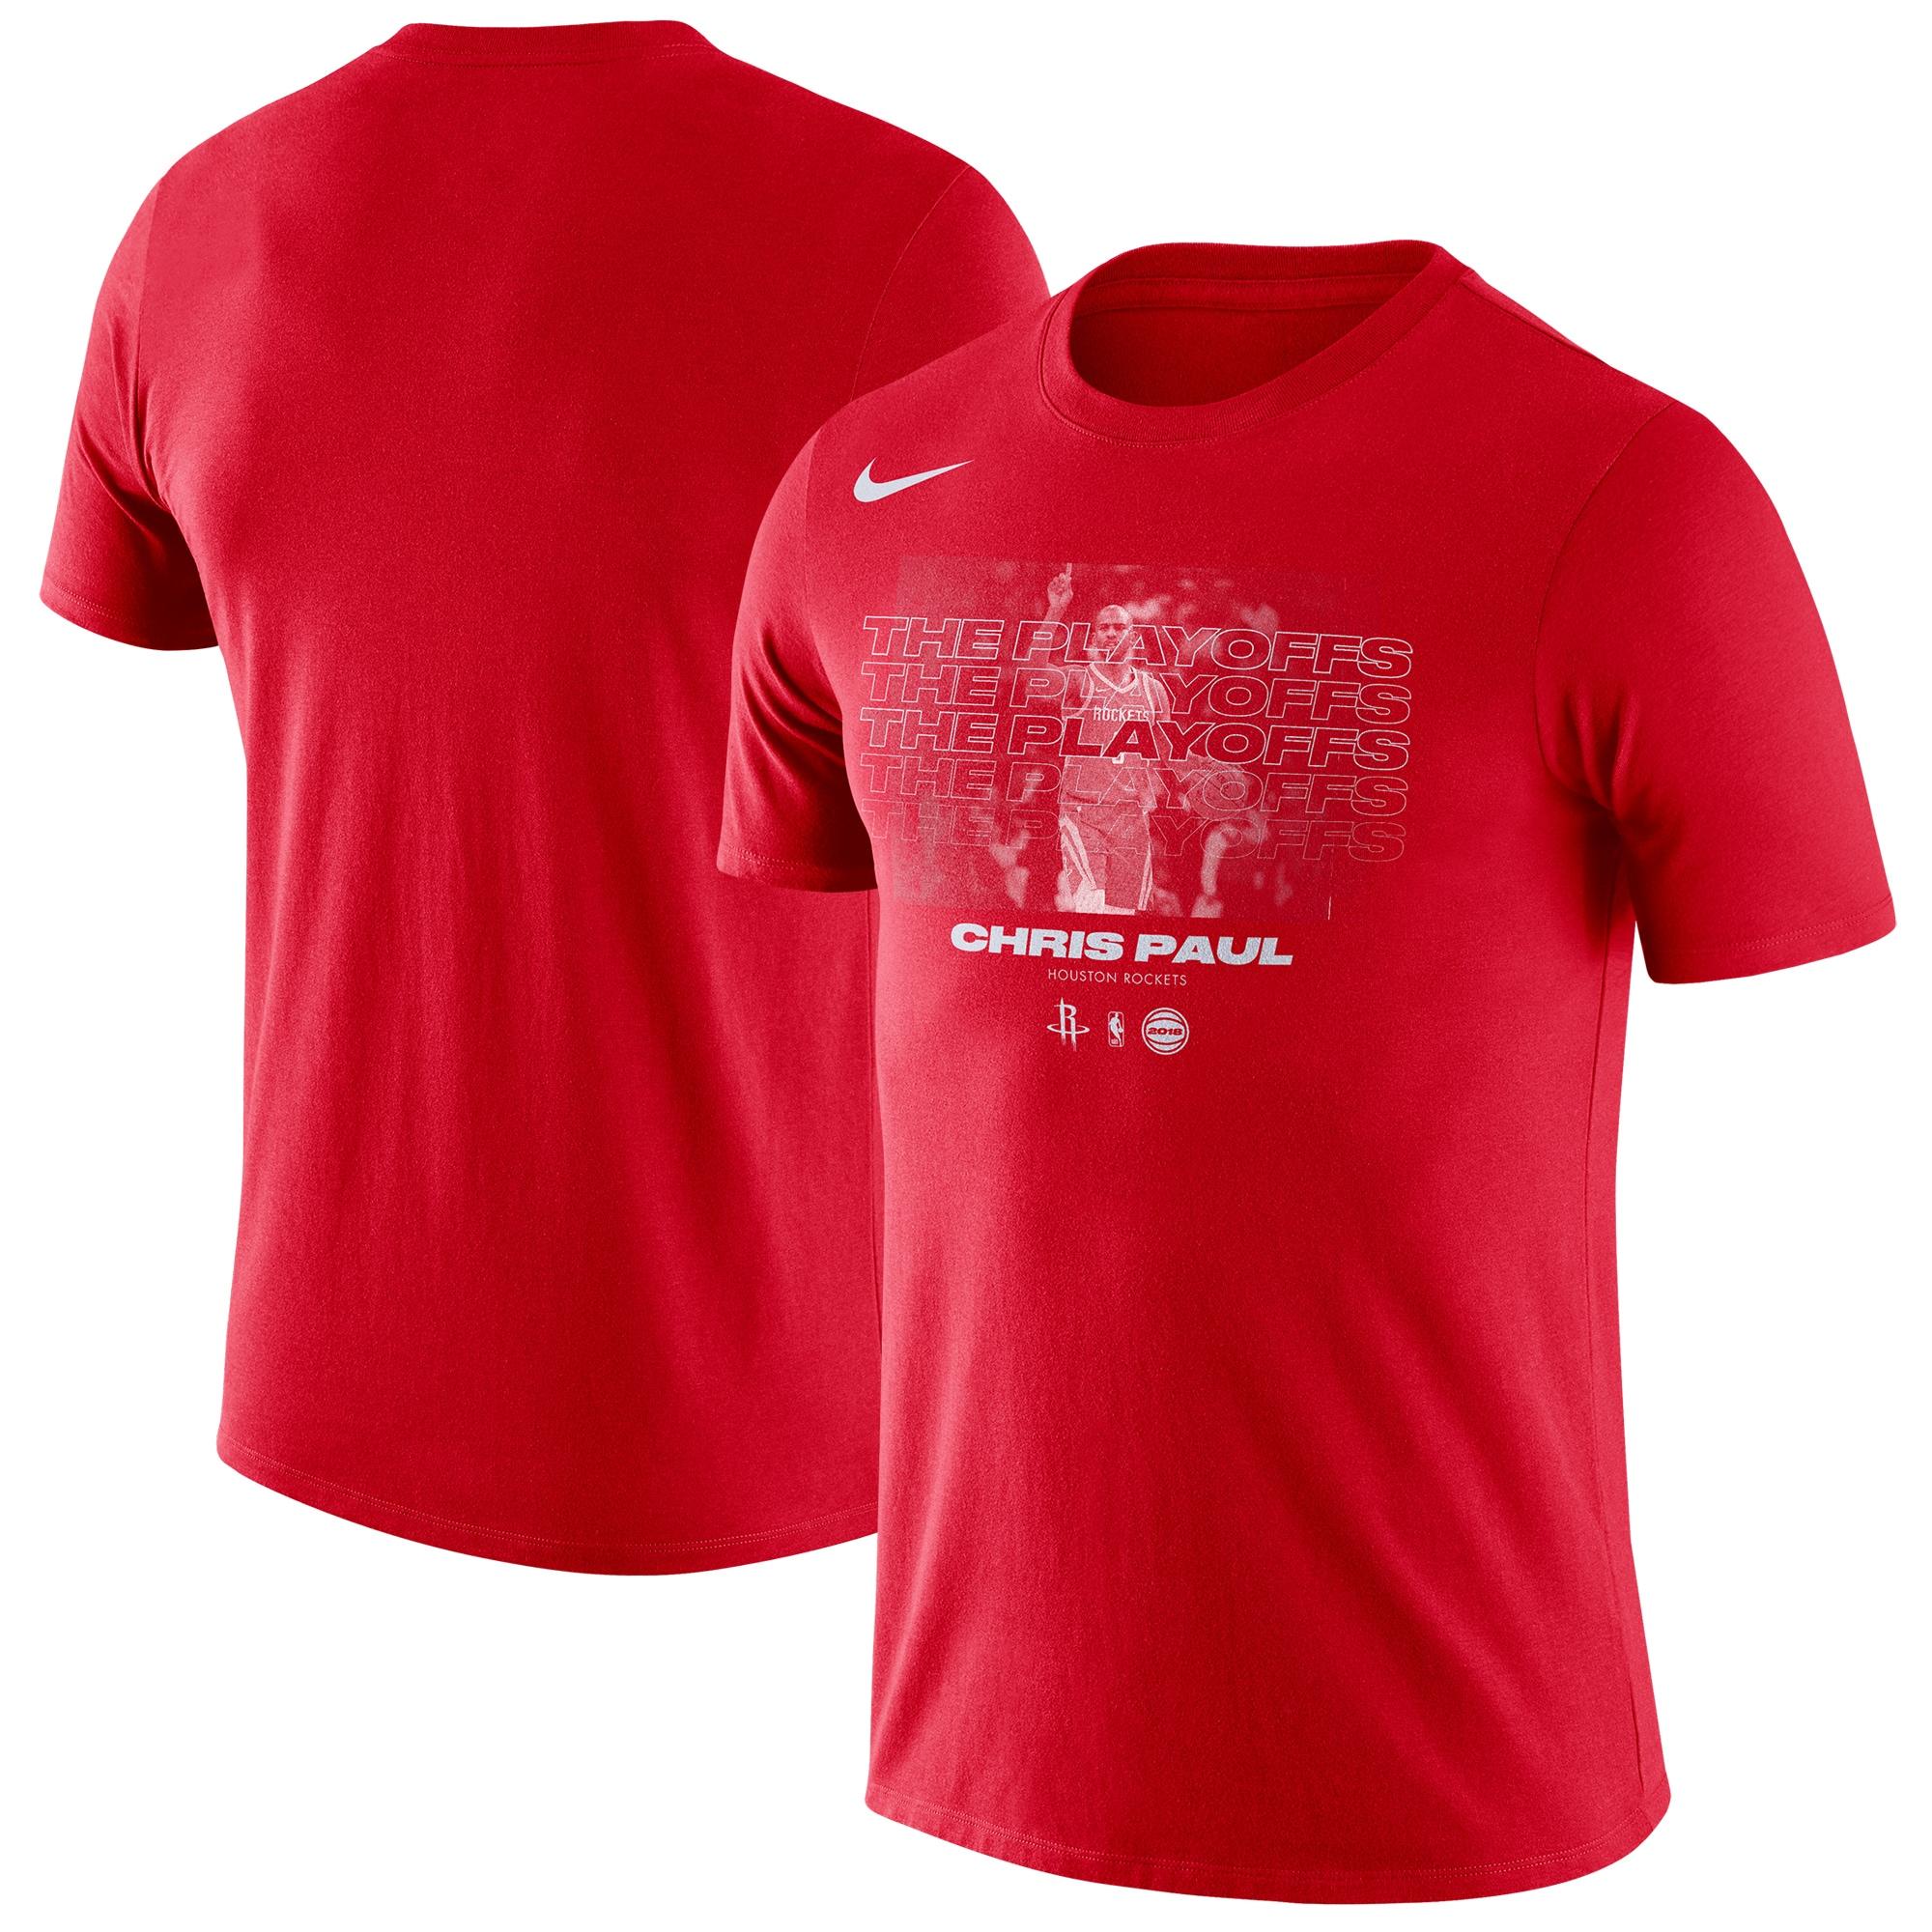 Chris Paul Houston Rockets Nike 2018 NBA Playoffs Player T-Shirt - Red